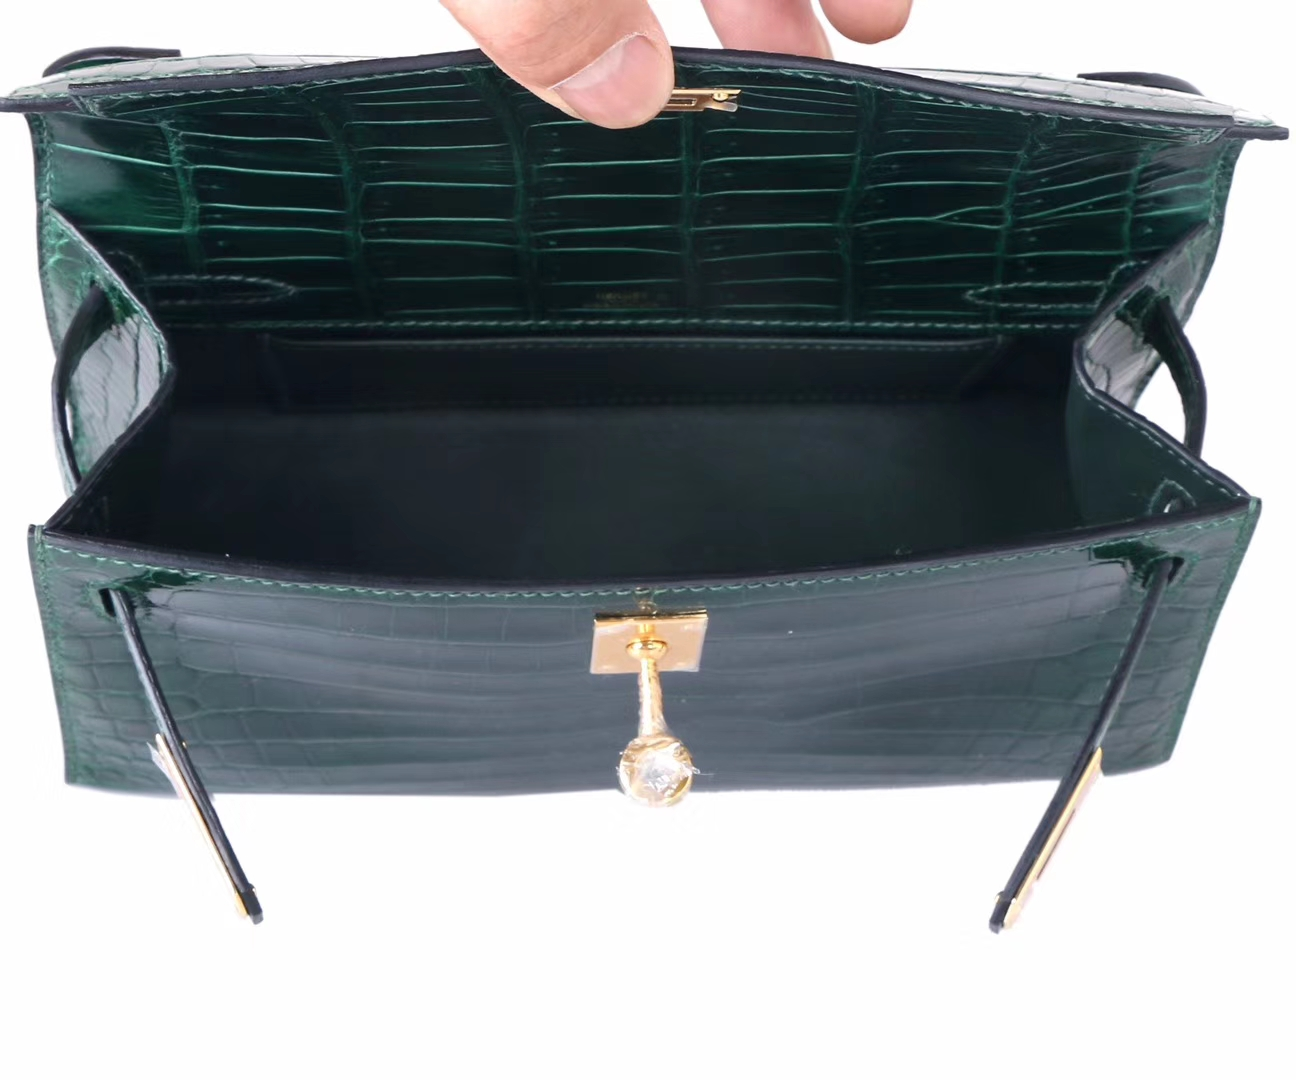 Hermès(爱马仕)miniKelly迷你凯莉 祖母绿 鳄鱼皮 一代 银扣 22cm